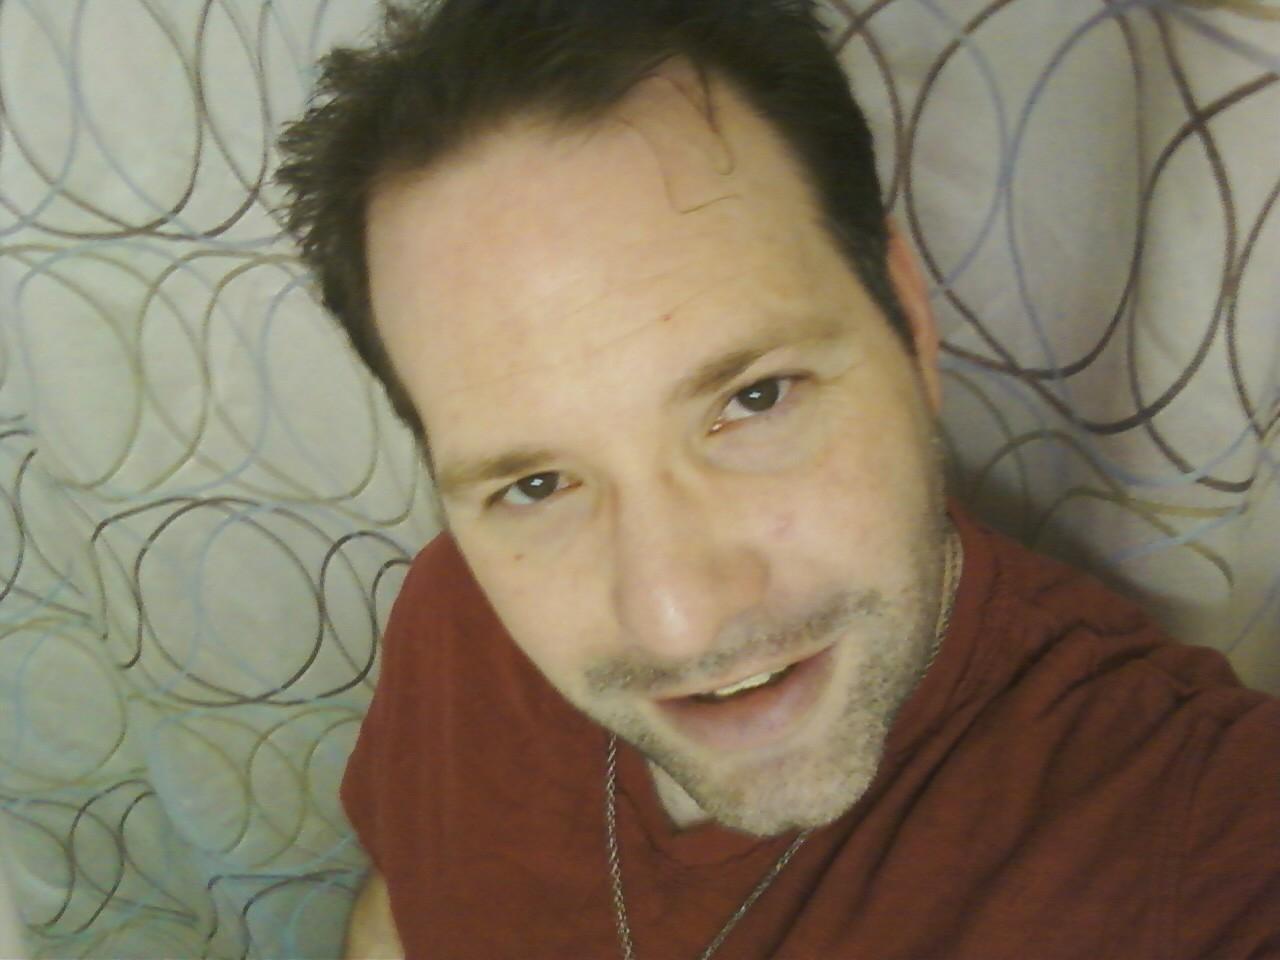 j.christopher2011